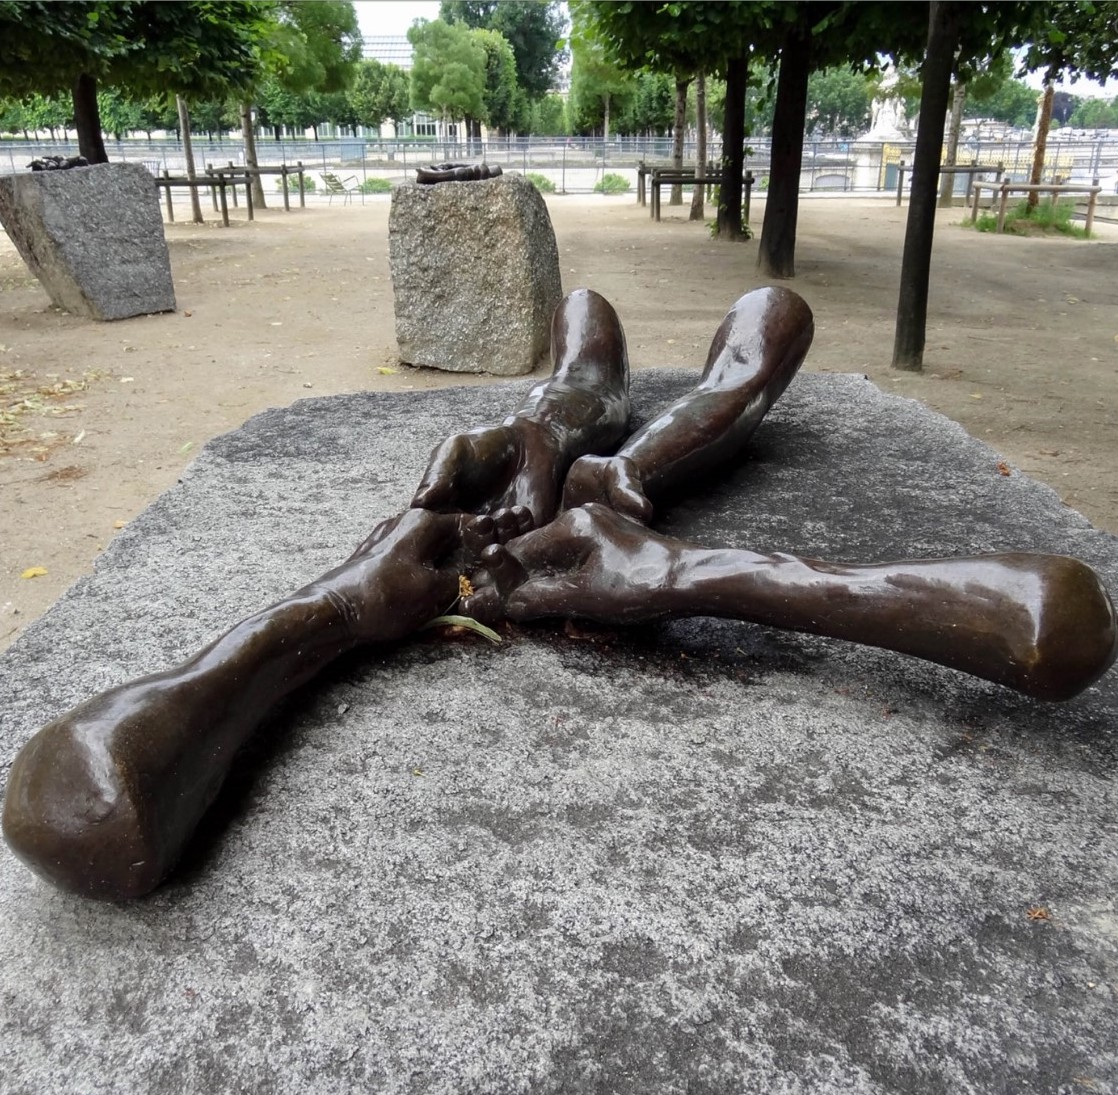 hatchikian-gallery-louise-bourgeois-francois-morellet-giuseppe-penone-focus-sur-3-oeuvres-contemporaines-installees-au-jardin-des-tuileries-blog